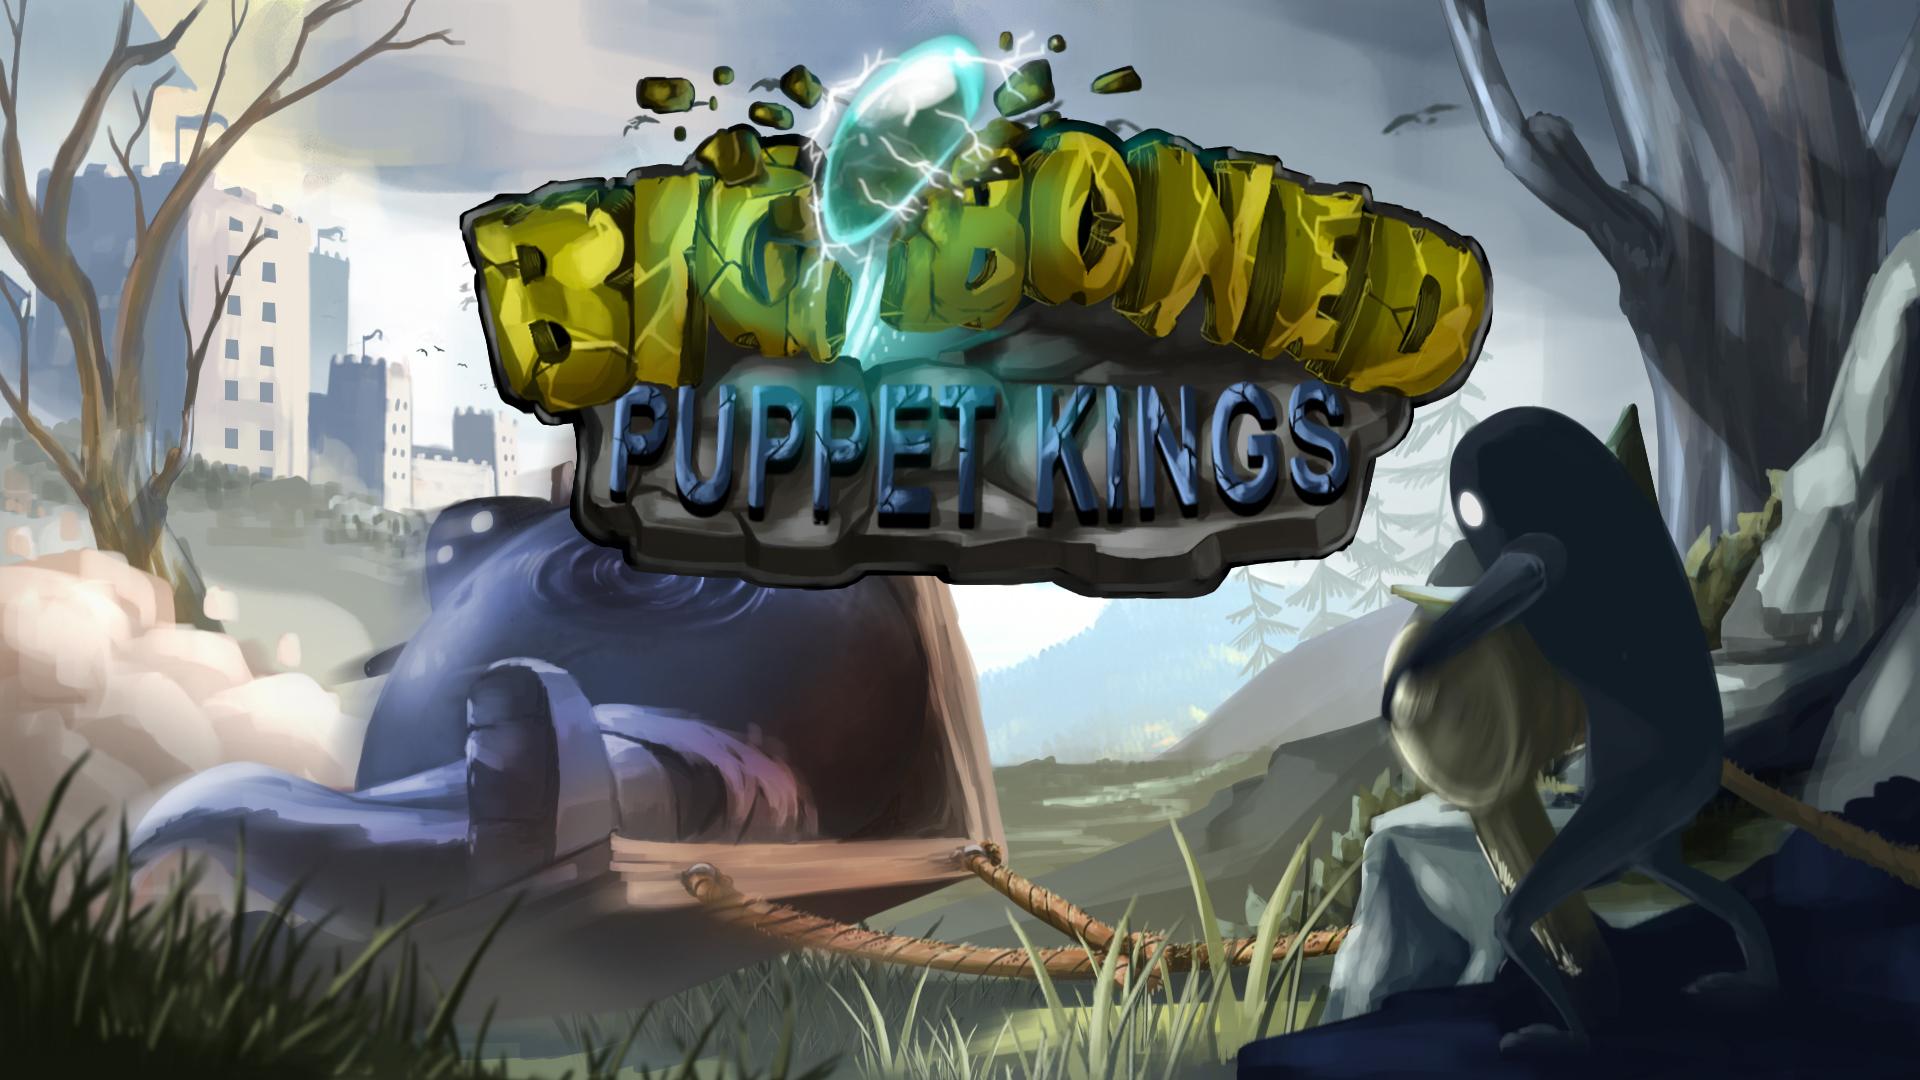 Big Boned Puppet Kings